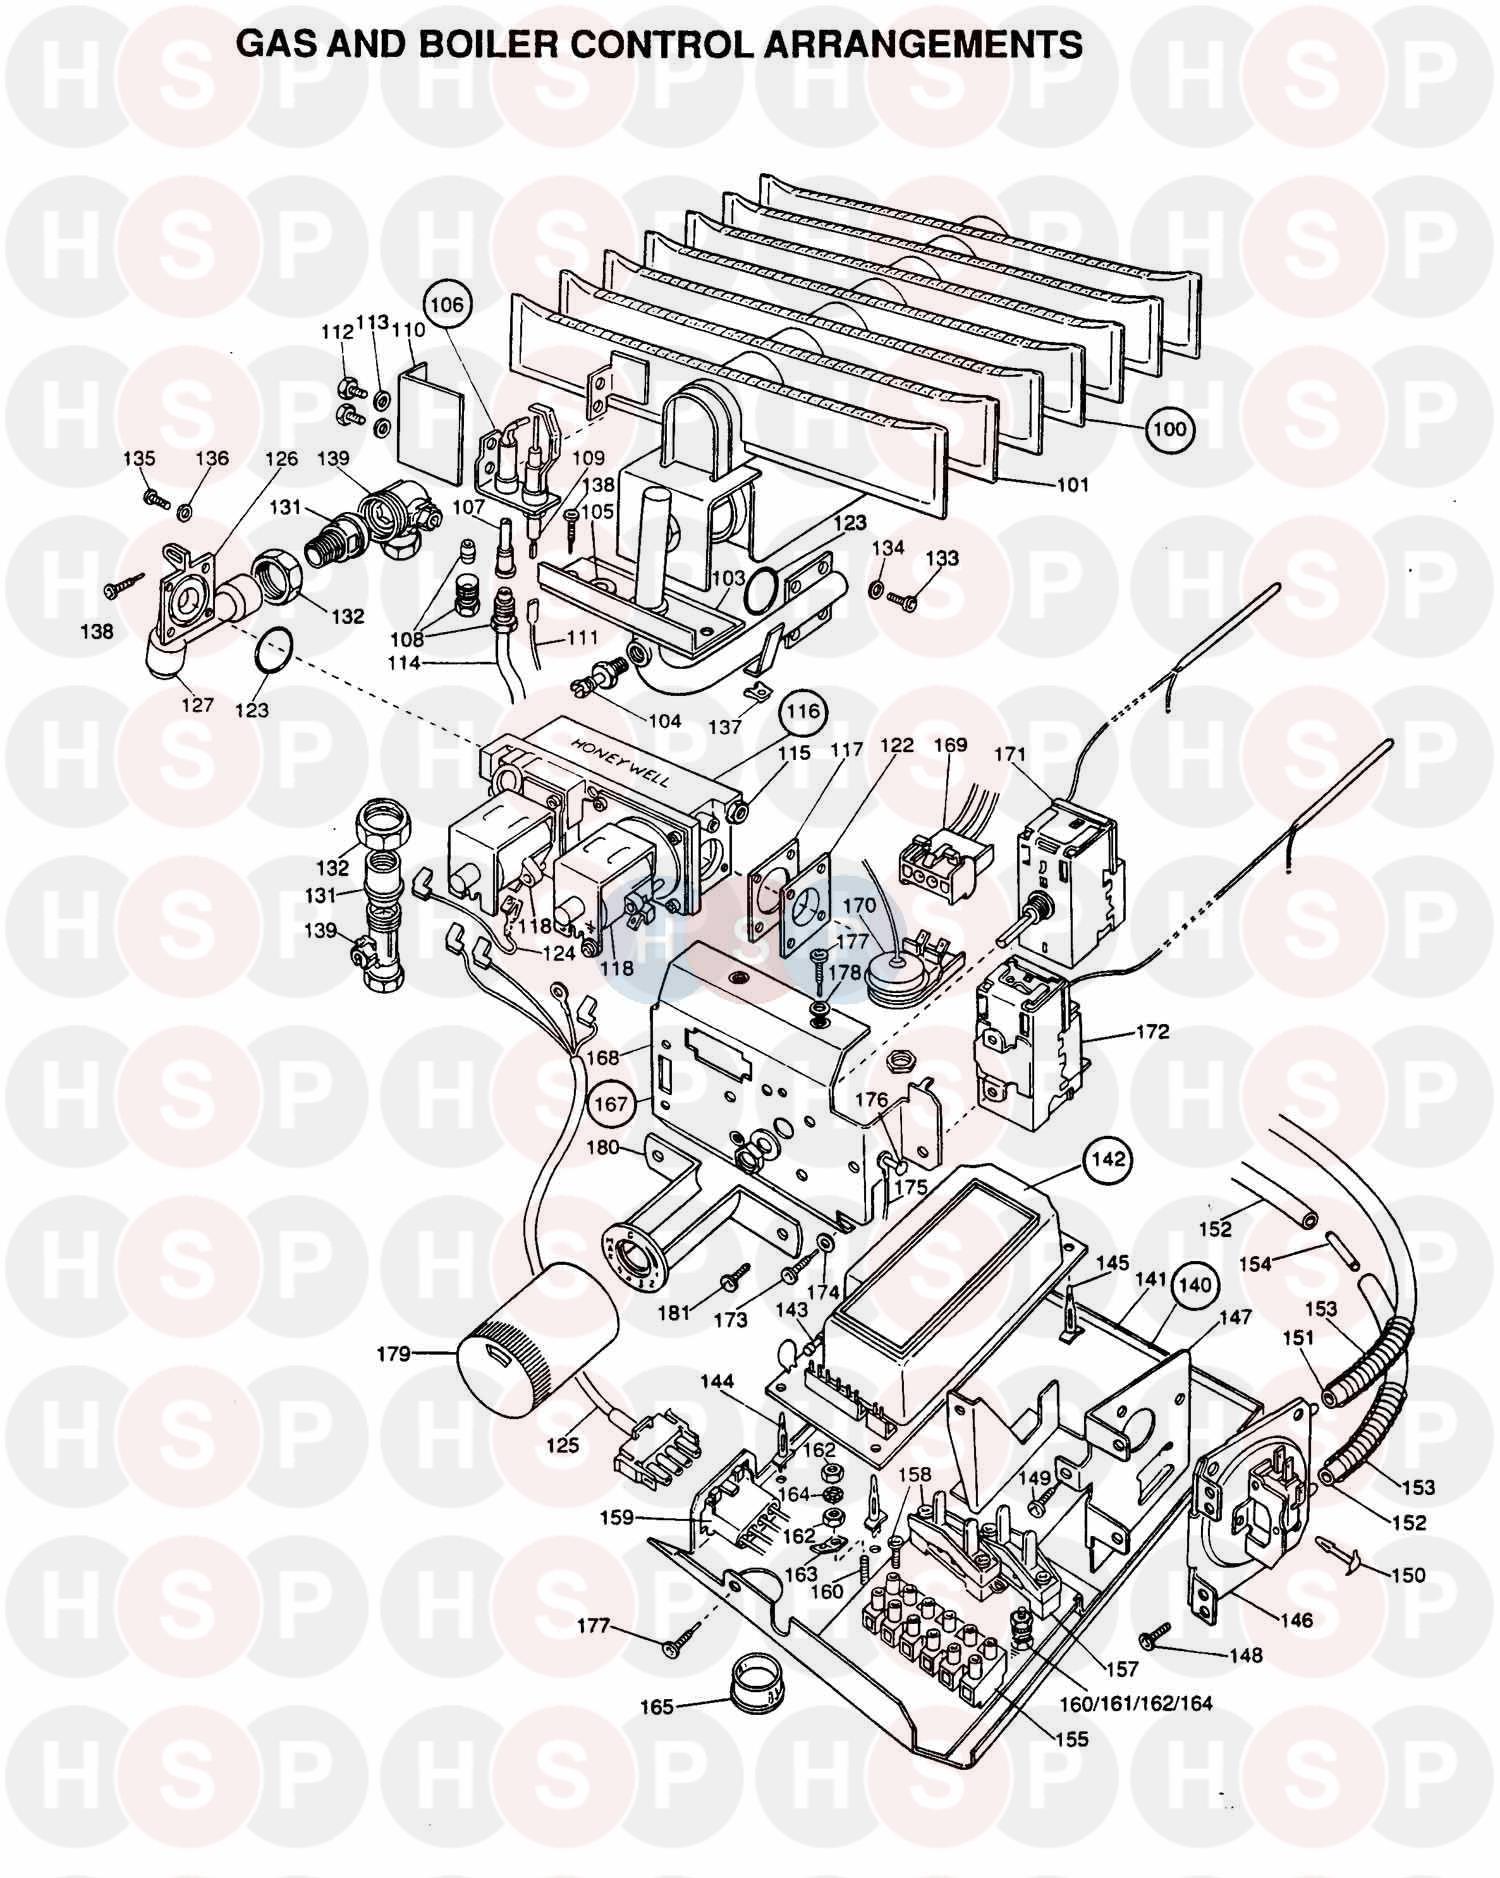 Potterton BRITISH GAS 50 F2 Appliance Diagram (Gas